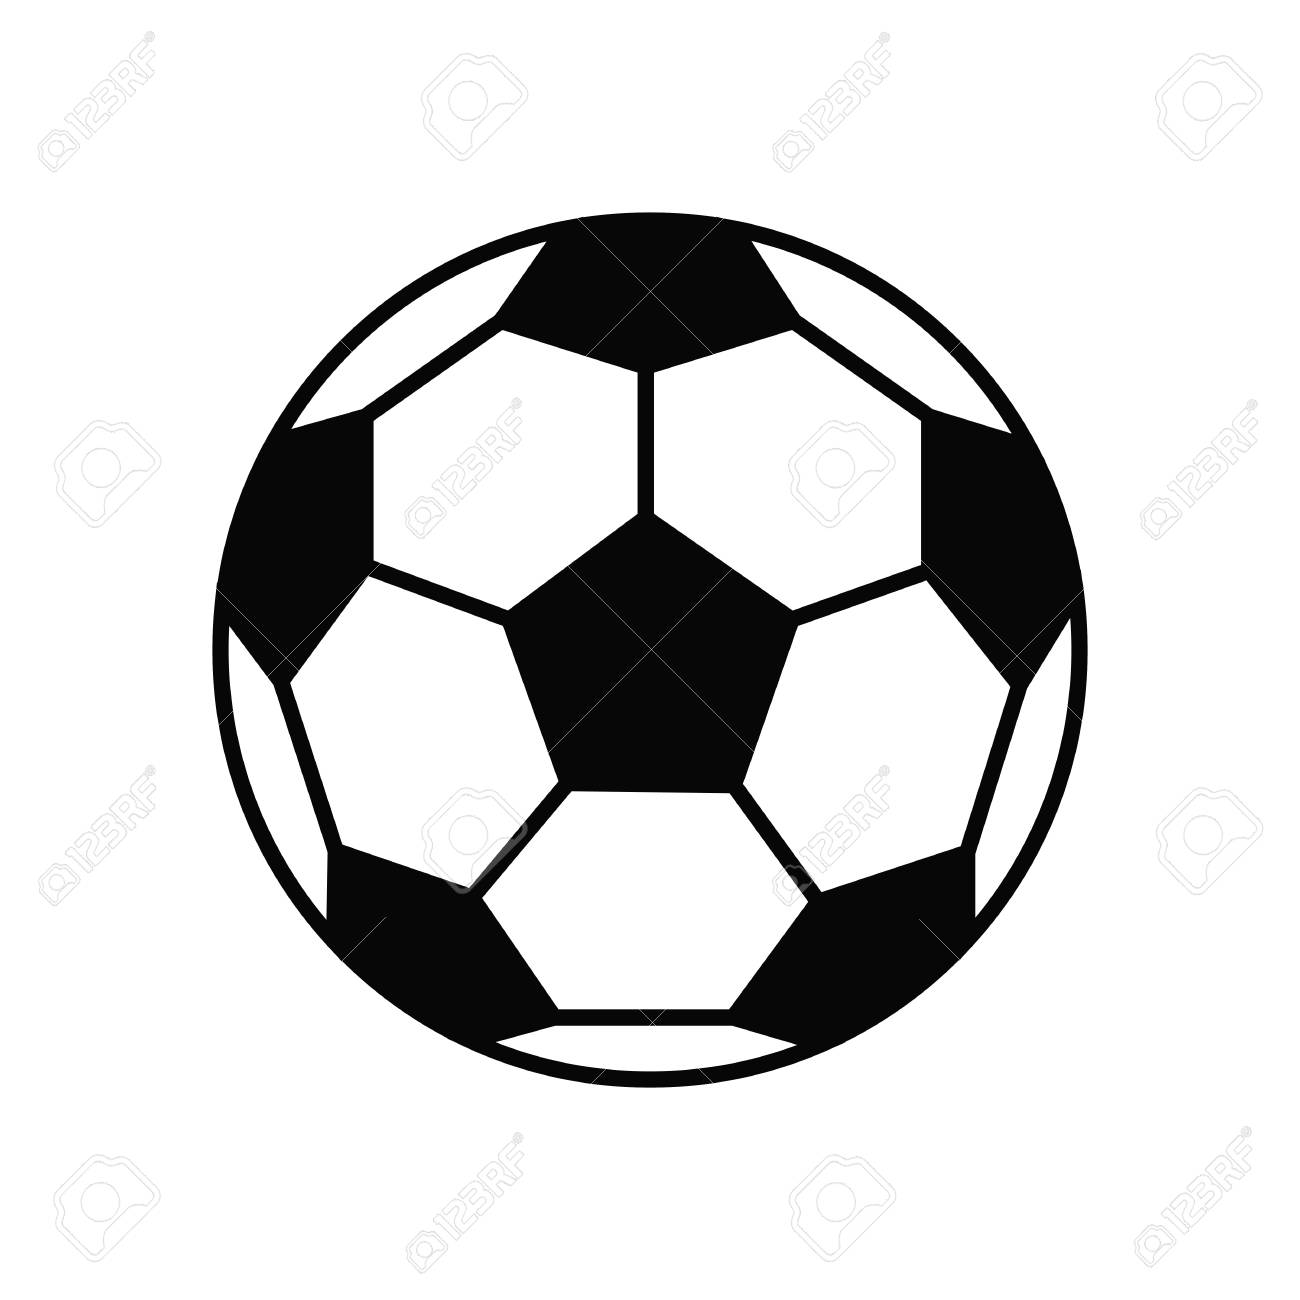 soccer ball football vector icon flat illustration royalty free rh 123rf com football vector free download football vector free download